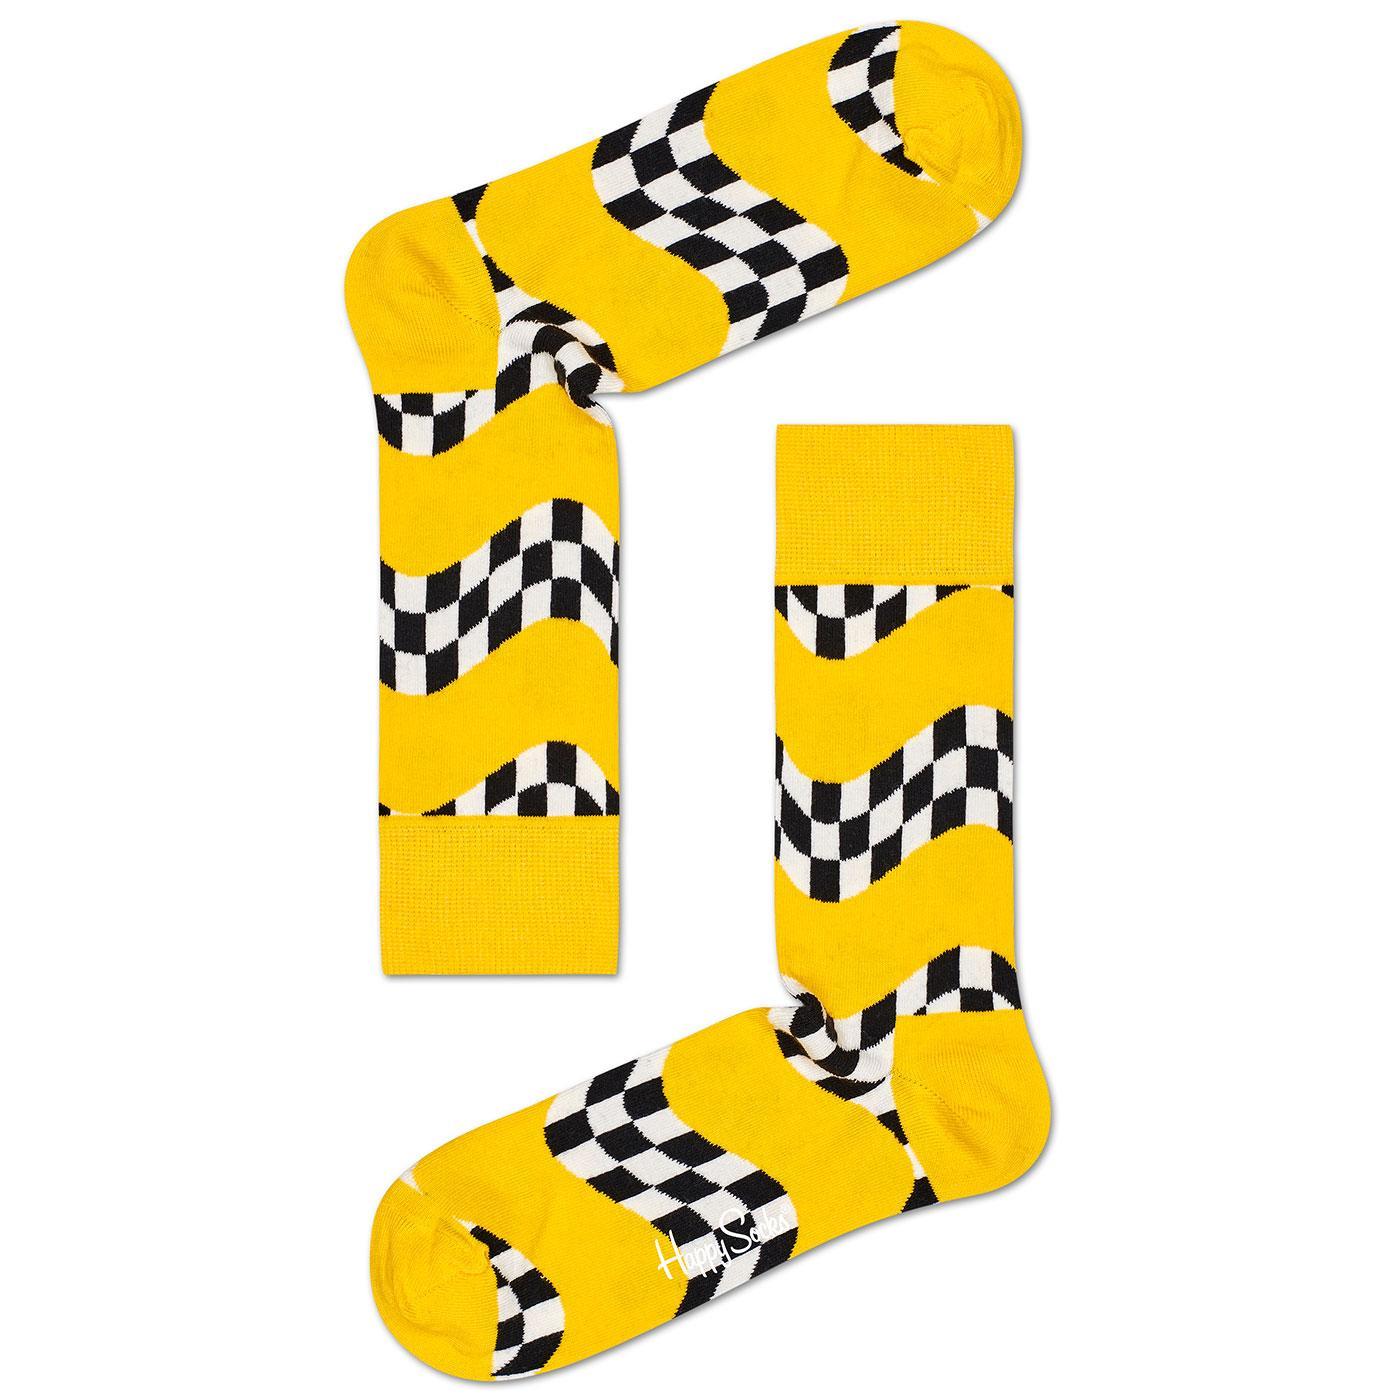 + Race HAPPY SOCKS Retro Checkerboard Flag Socks